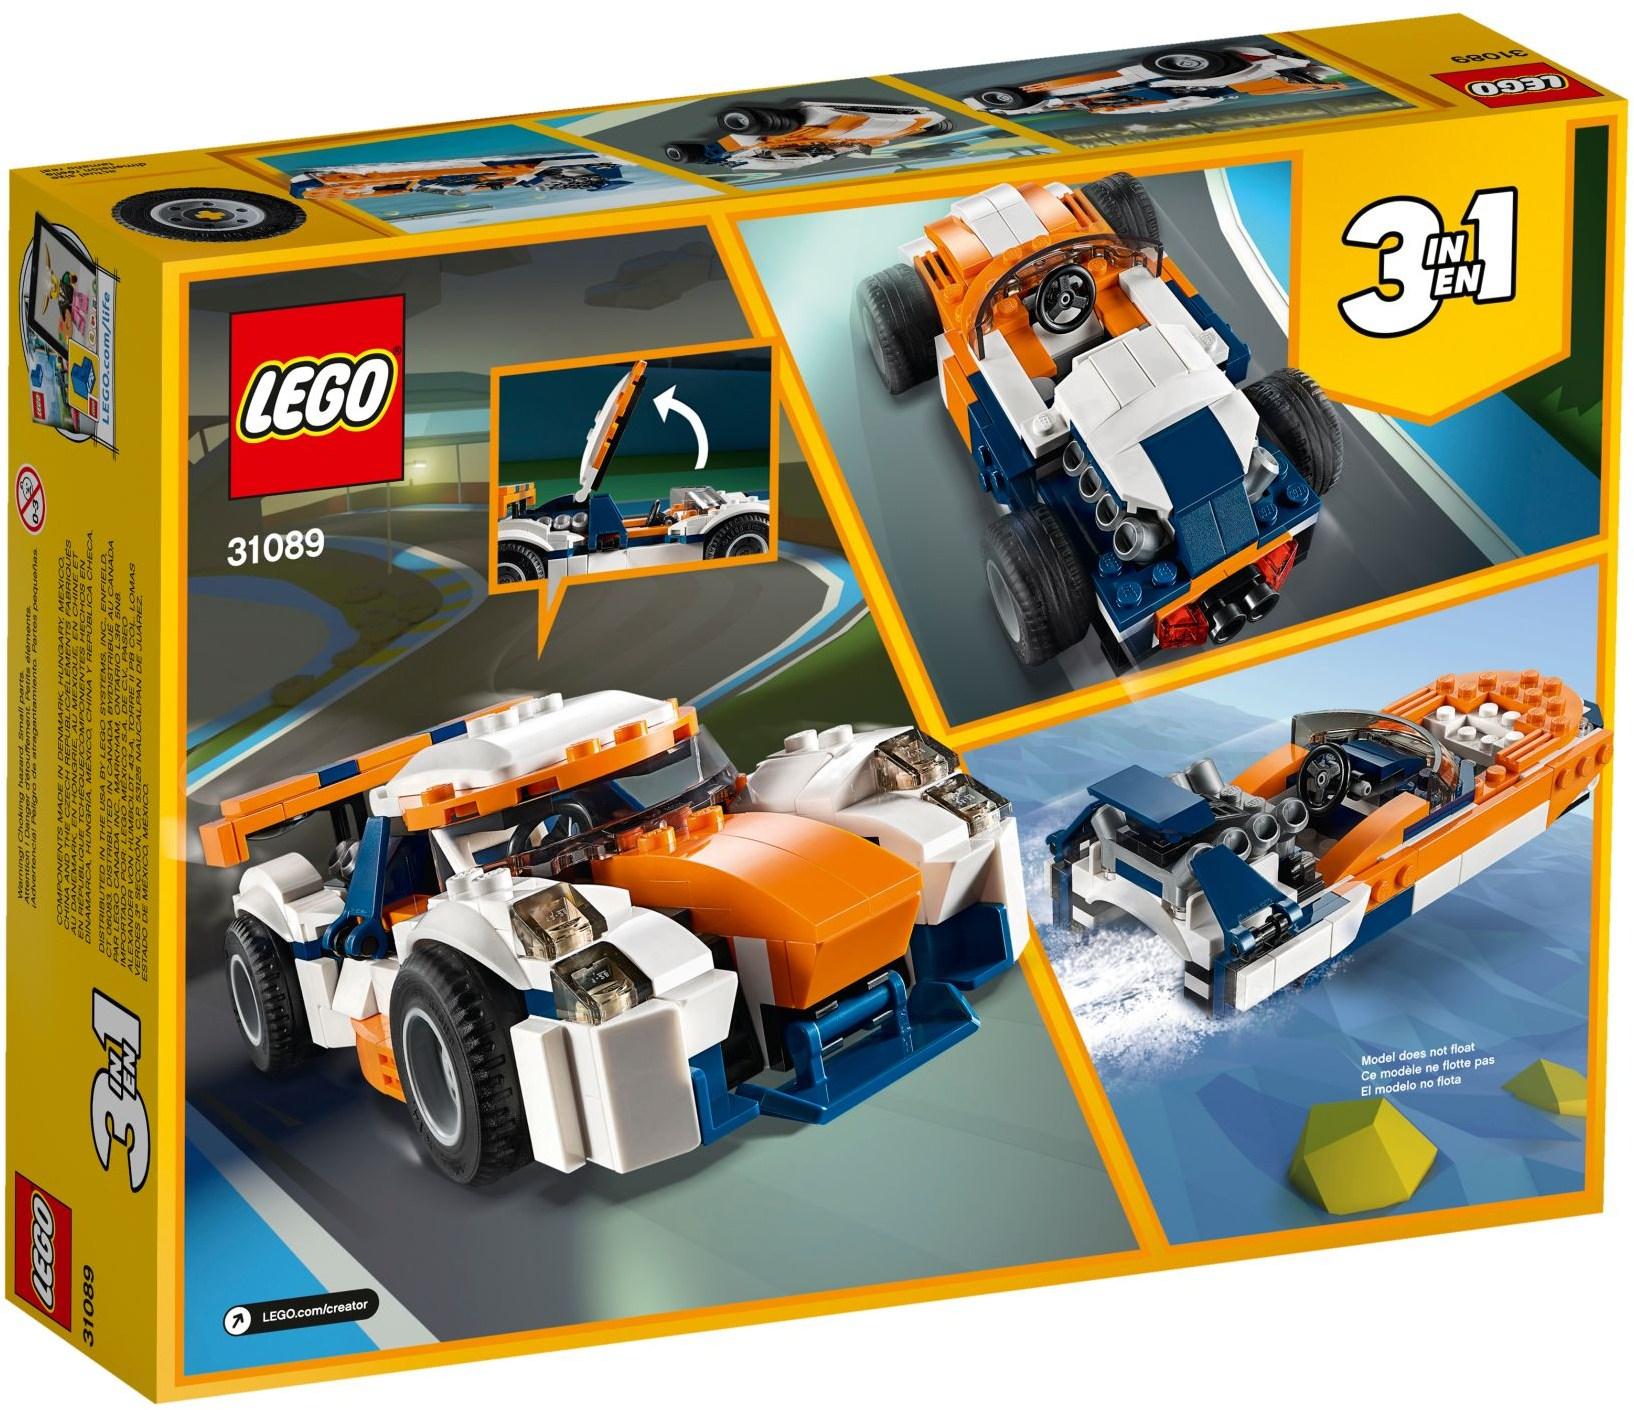 LEGO SUNSET TRACK RACER - 31089